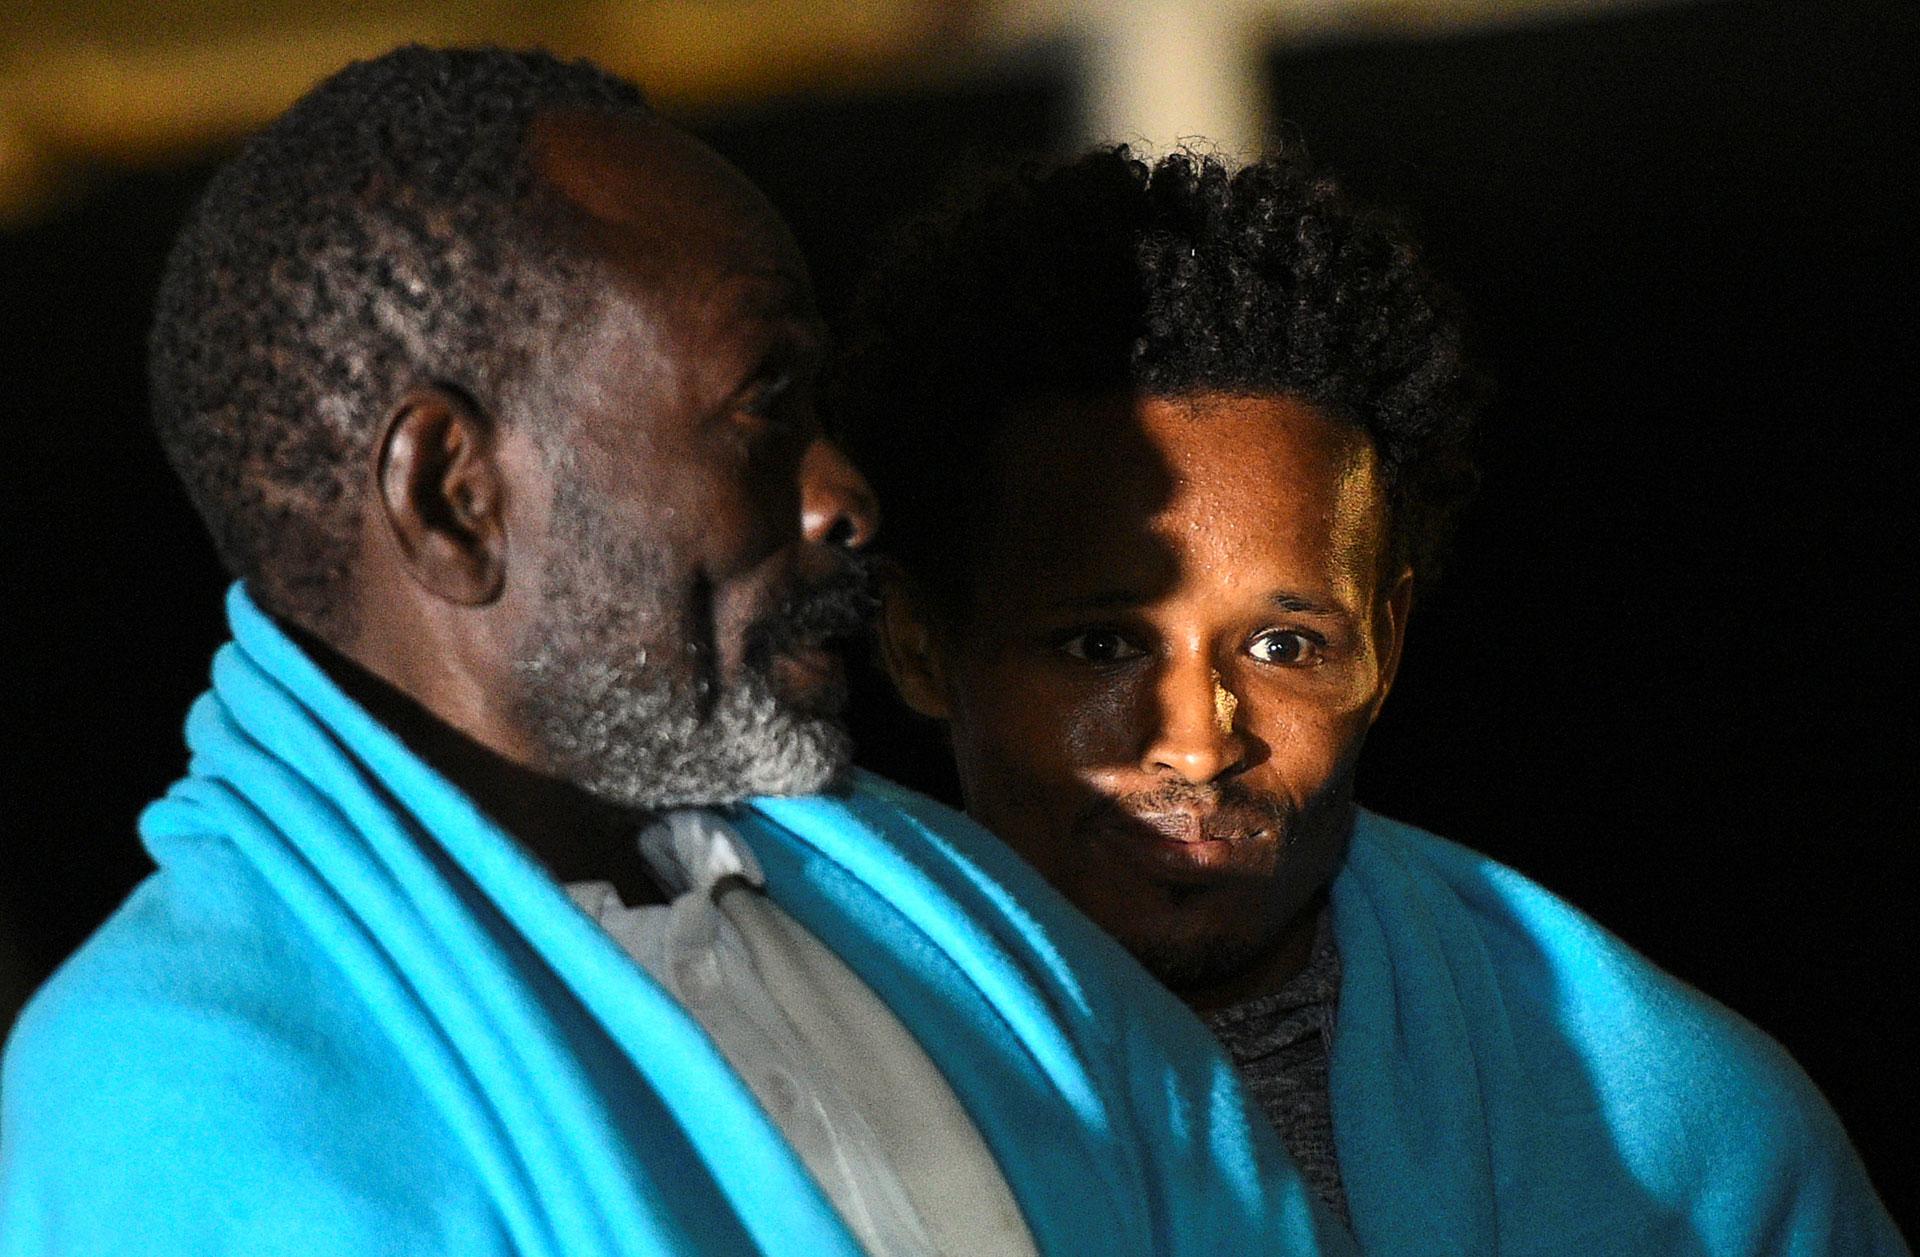 Dos hombres observan el muelle tras el arribo del barco(REUTERS/Guglielmo Mangiapane)